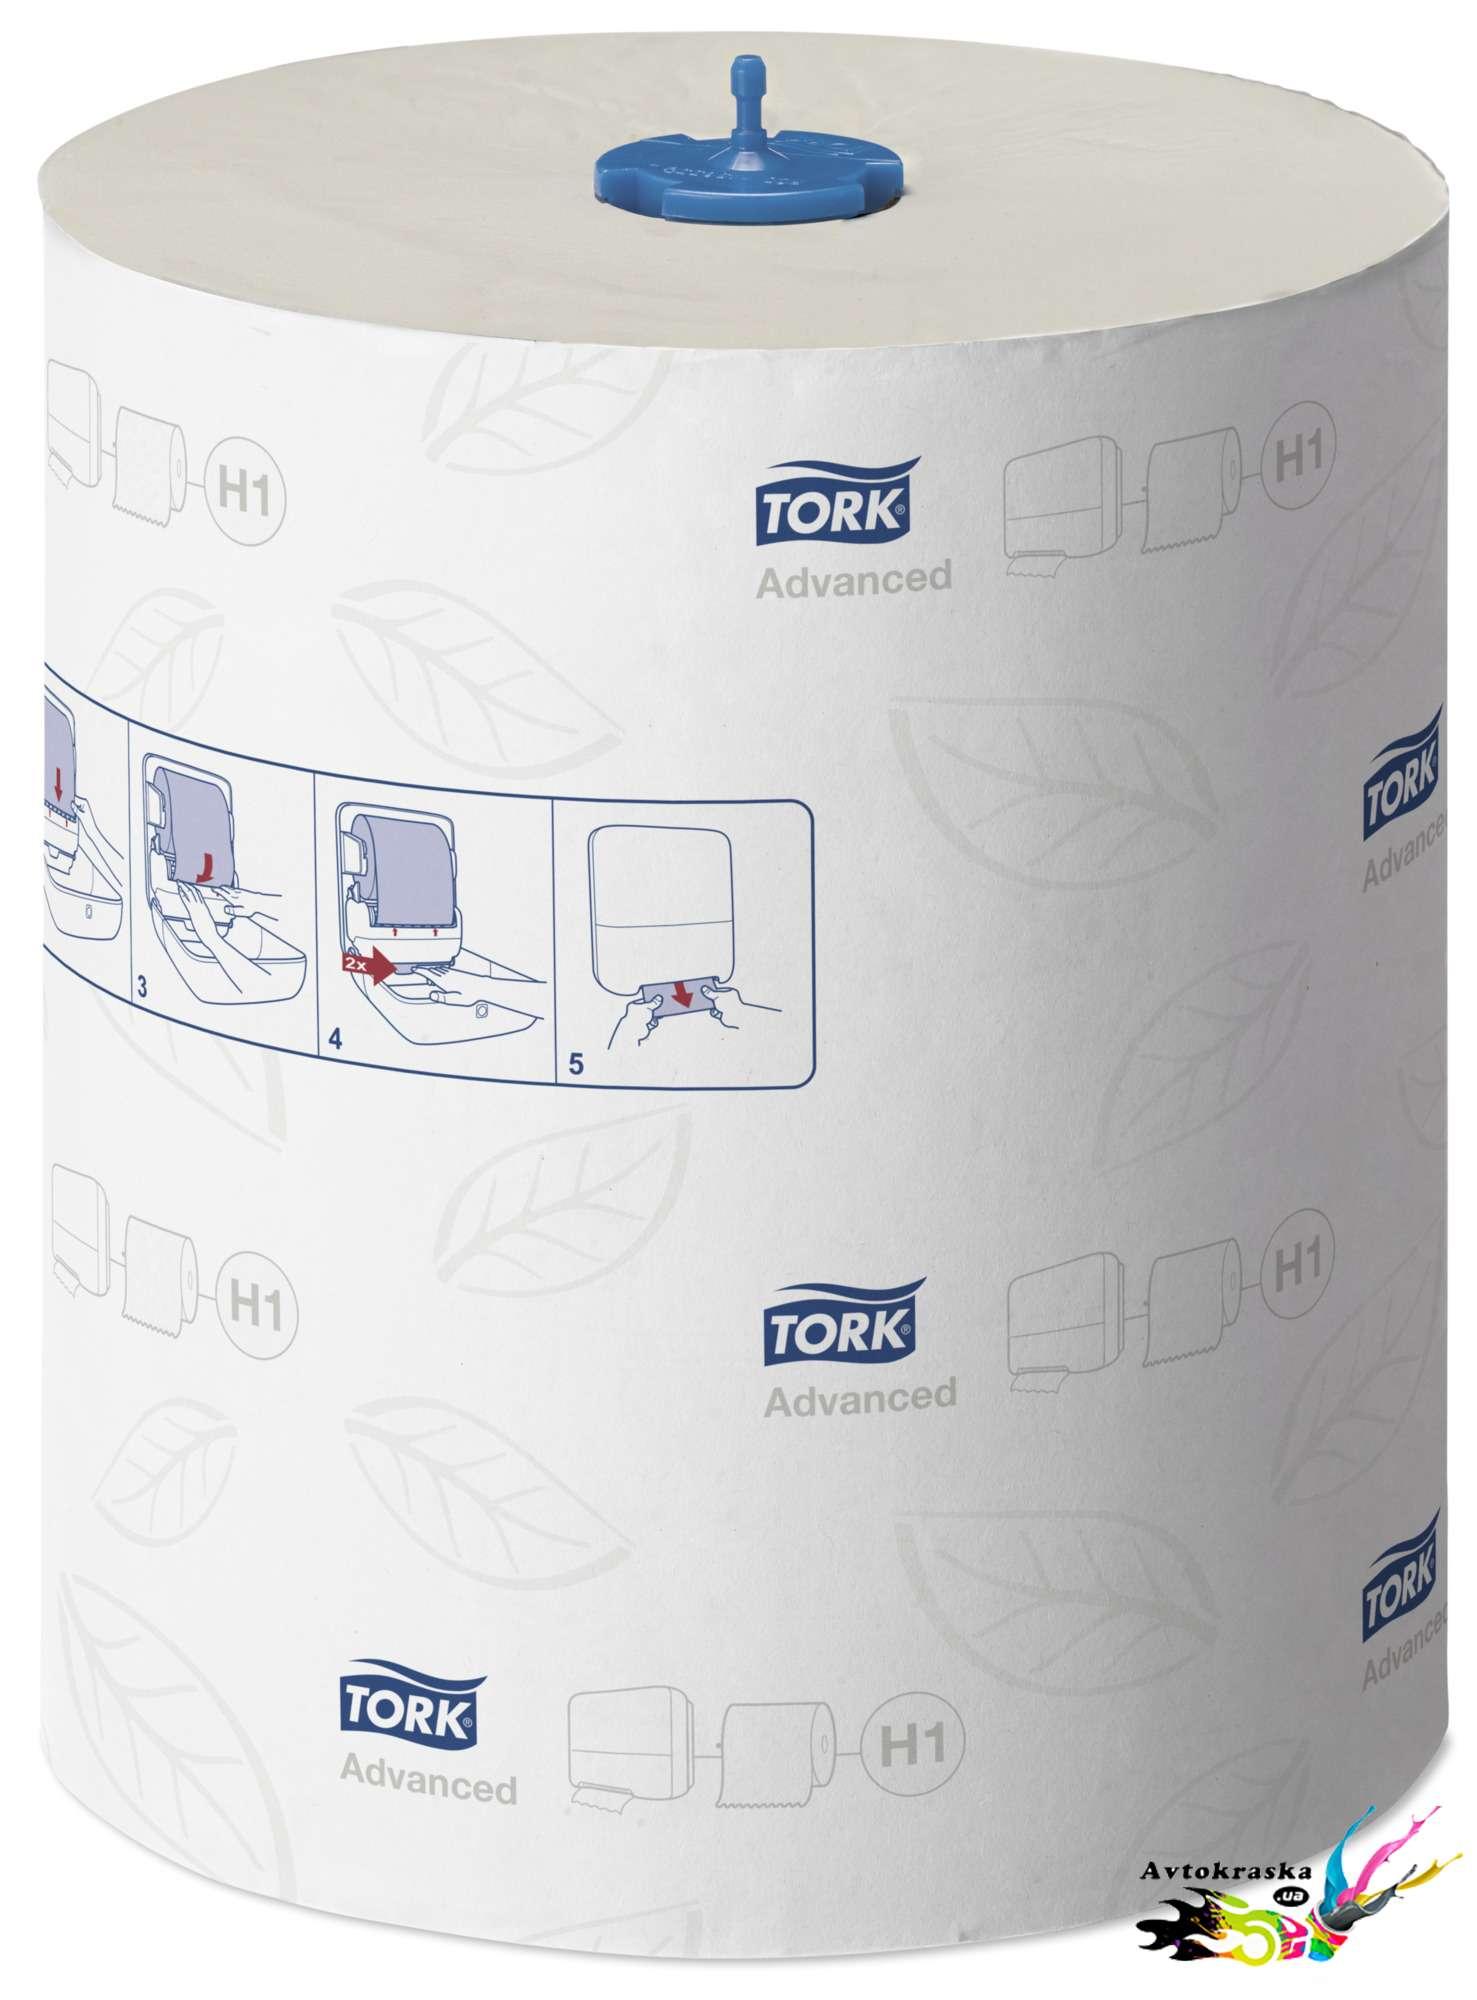 Tork полотенца для рук 120067 Advanced